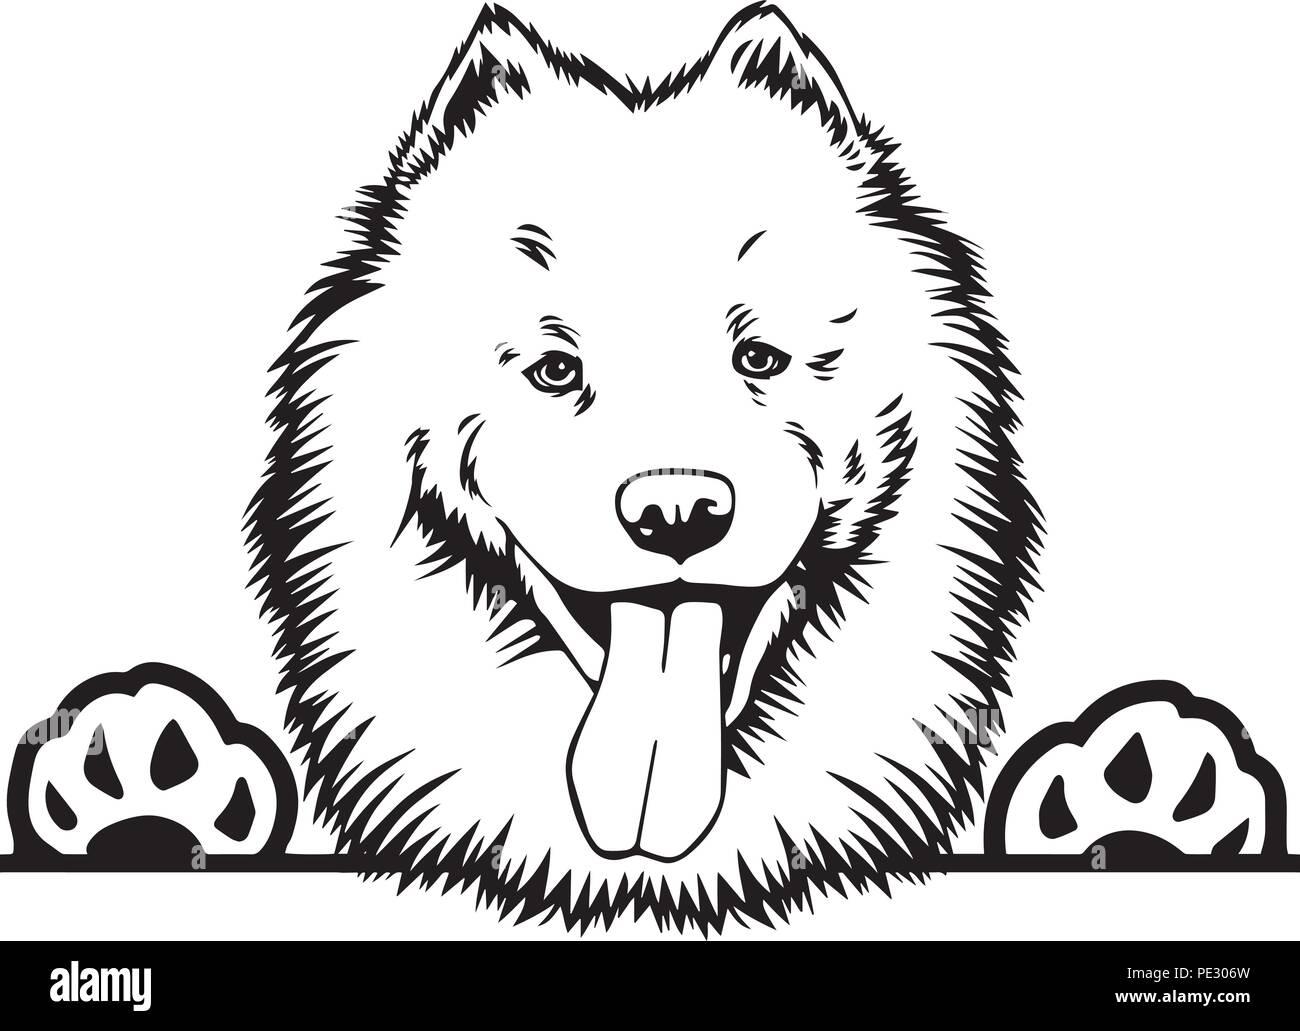 Samoyed Dog Breed Pet Puppy Isolated Head Face Stock Vector Art